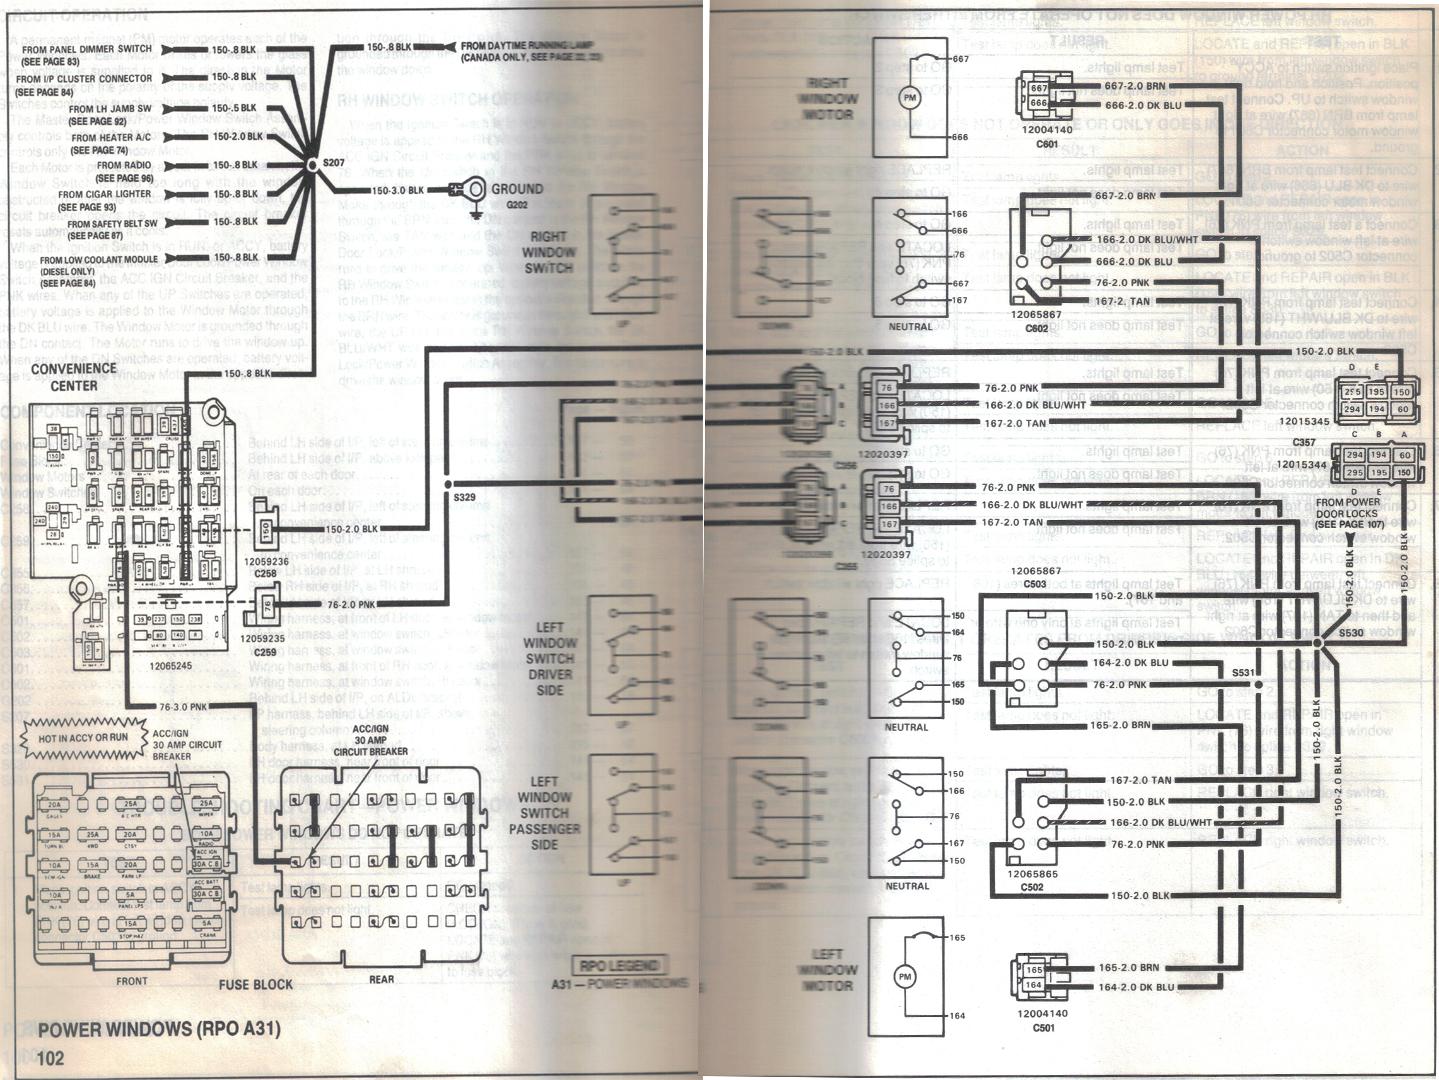 Download 2002 S10 Stereo Wiring Diagram Full Quality Spreadem Kinggo Fr